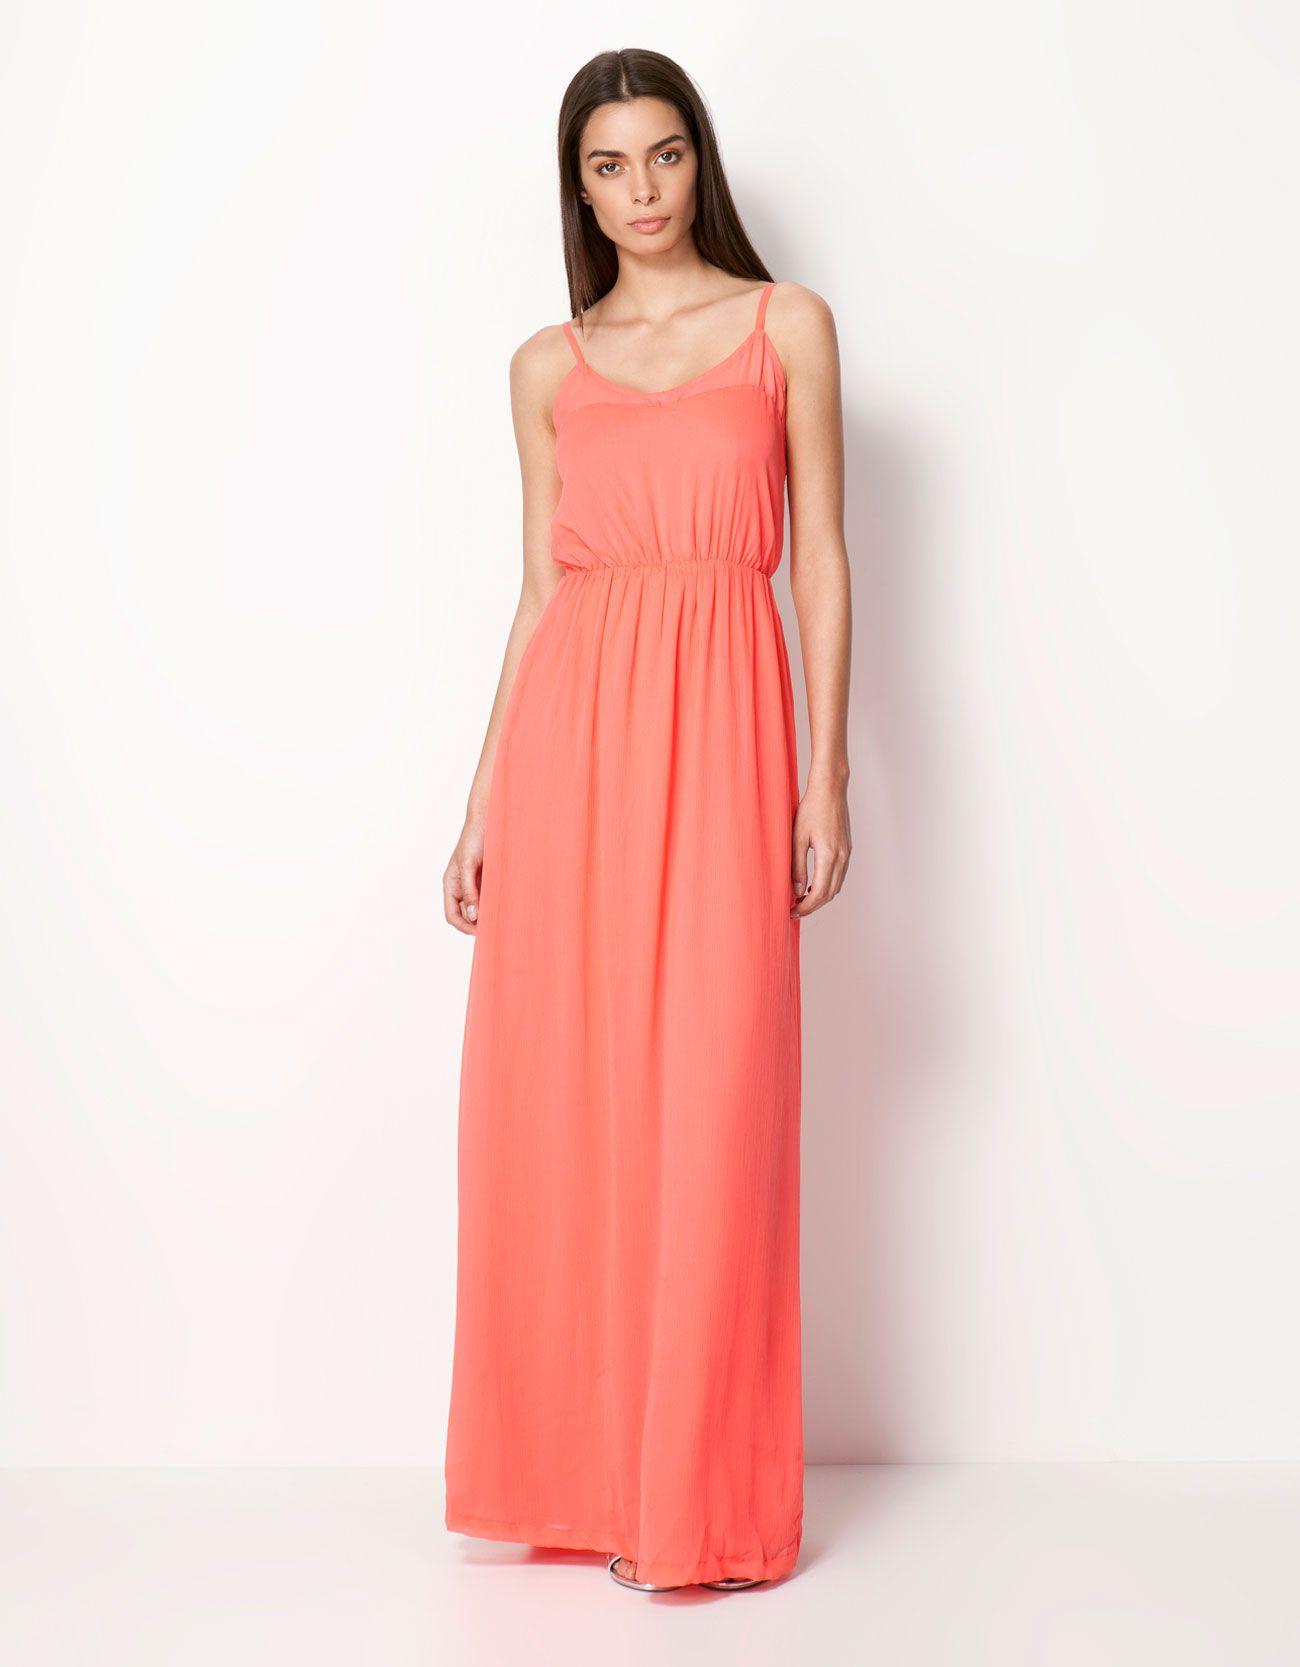 e8d40e672094 Bershka Serbia - Bershka long dress